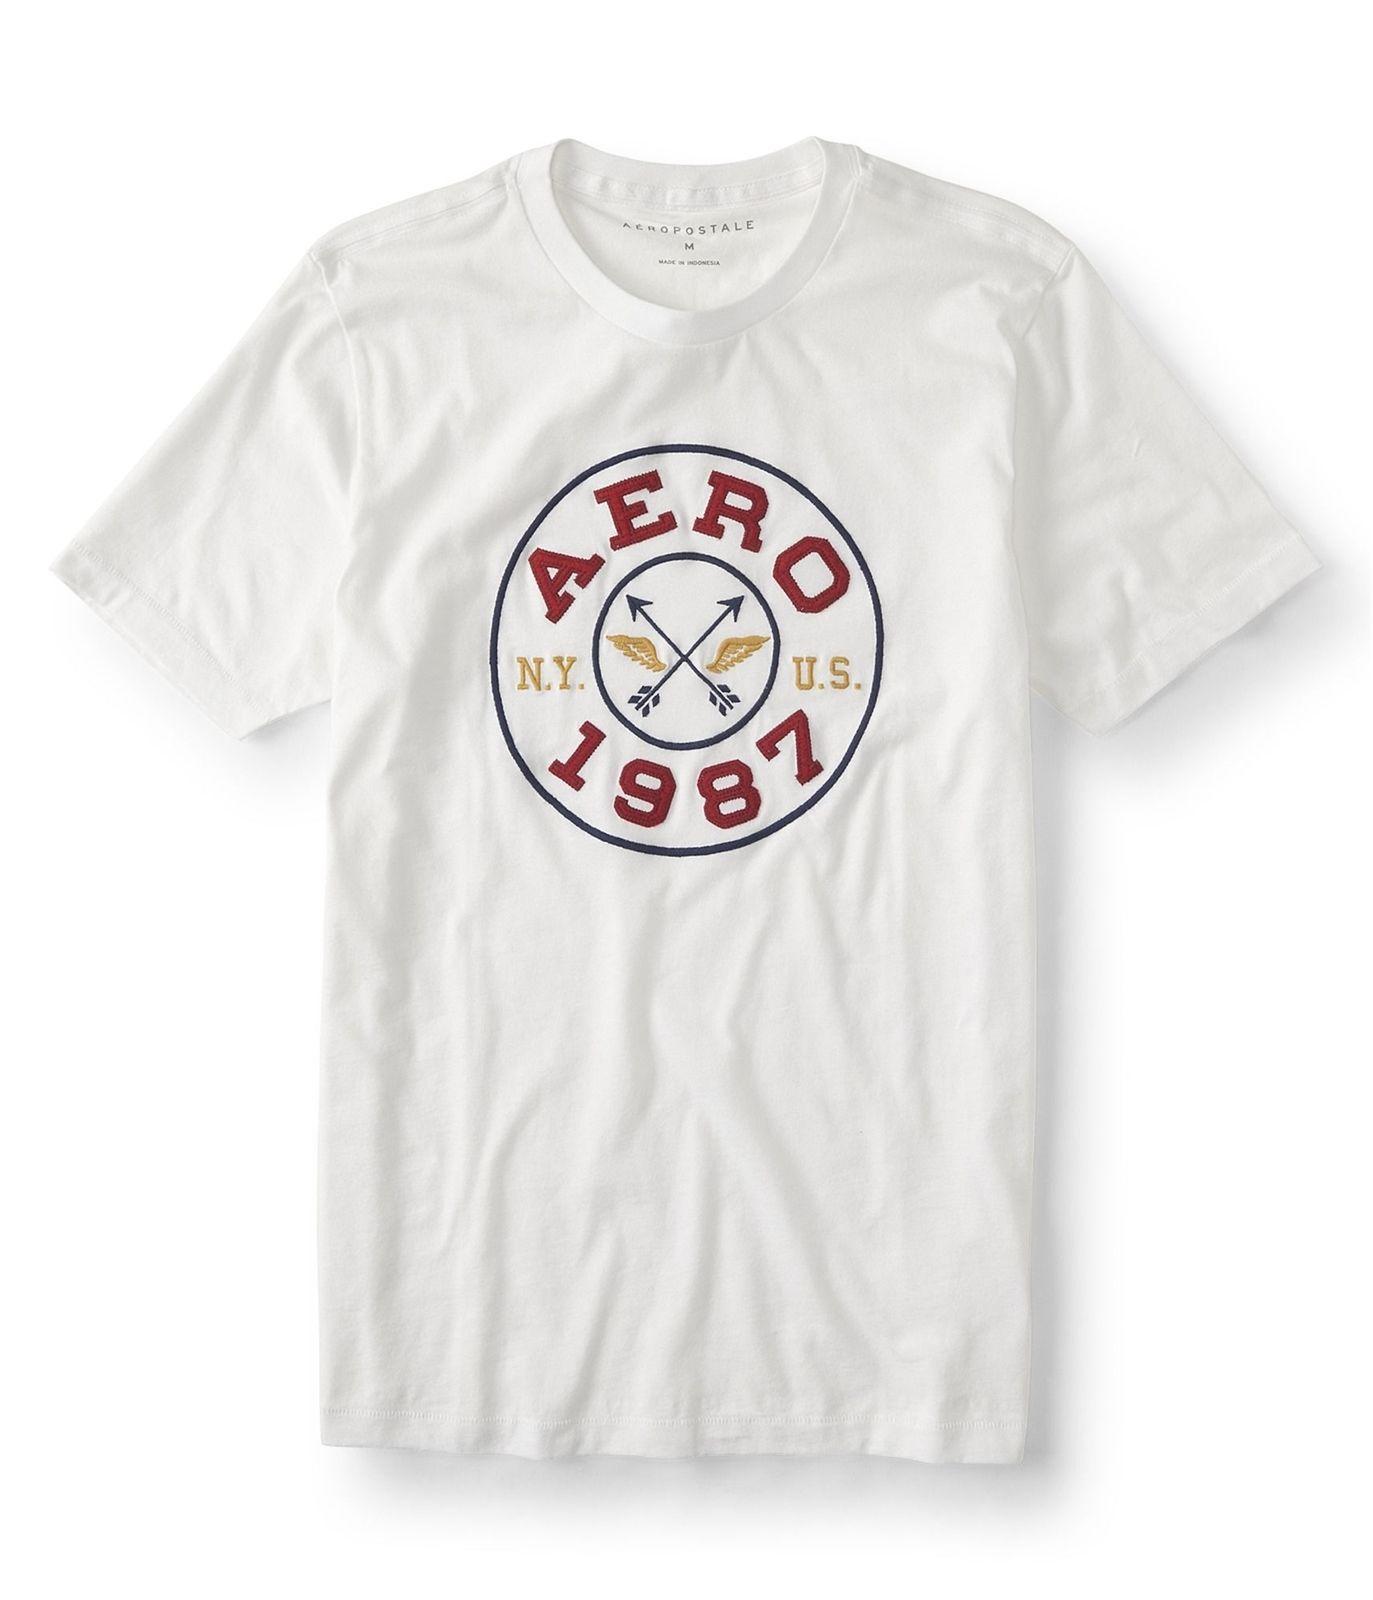 808b6e85 Aeropostale Mens 1987 Circle Graphic T Shirt 102 M Long Sleeve Shirts Men  Shirts From Marcusdover, $11.54| DHgate.Com